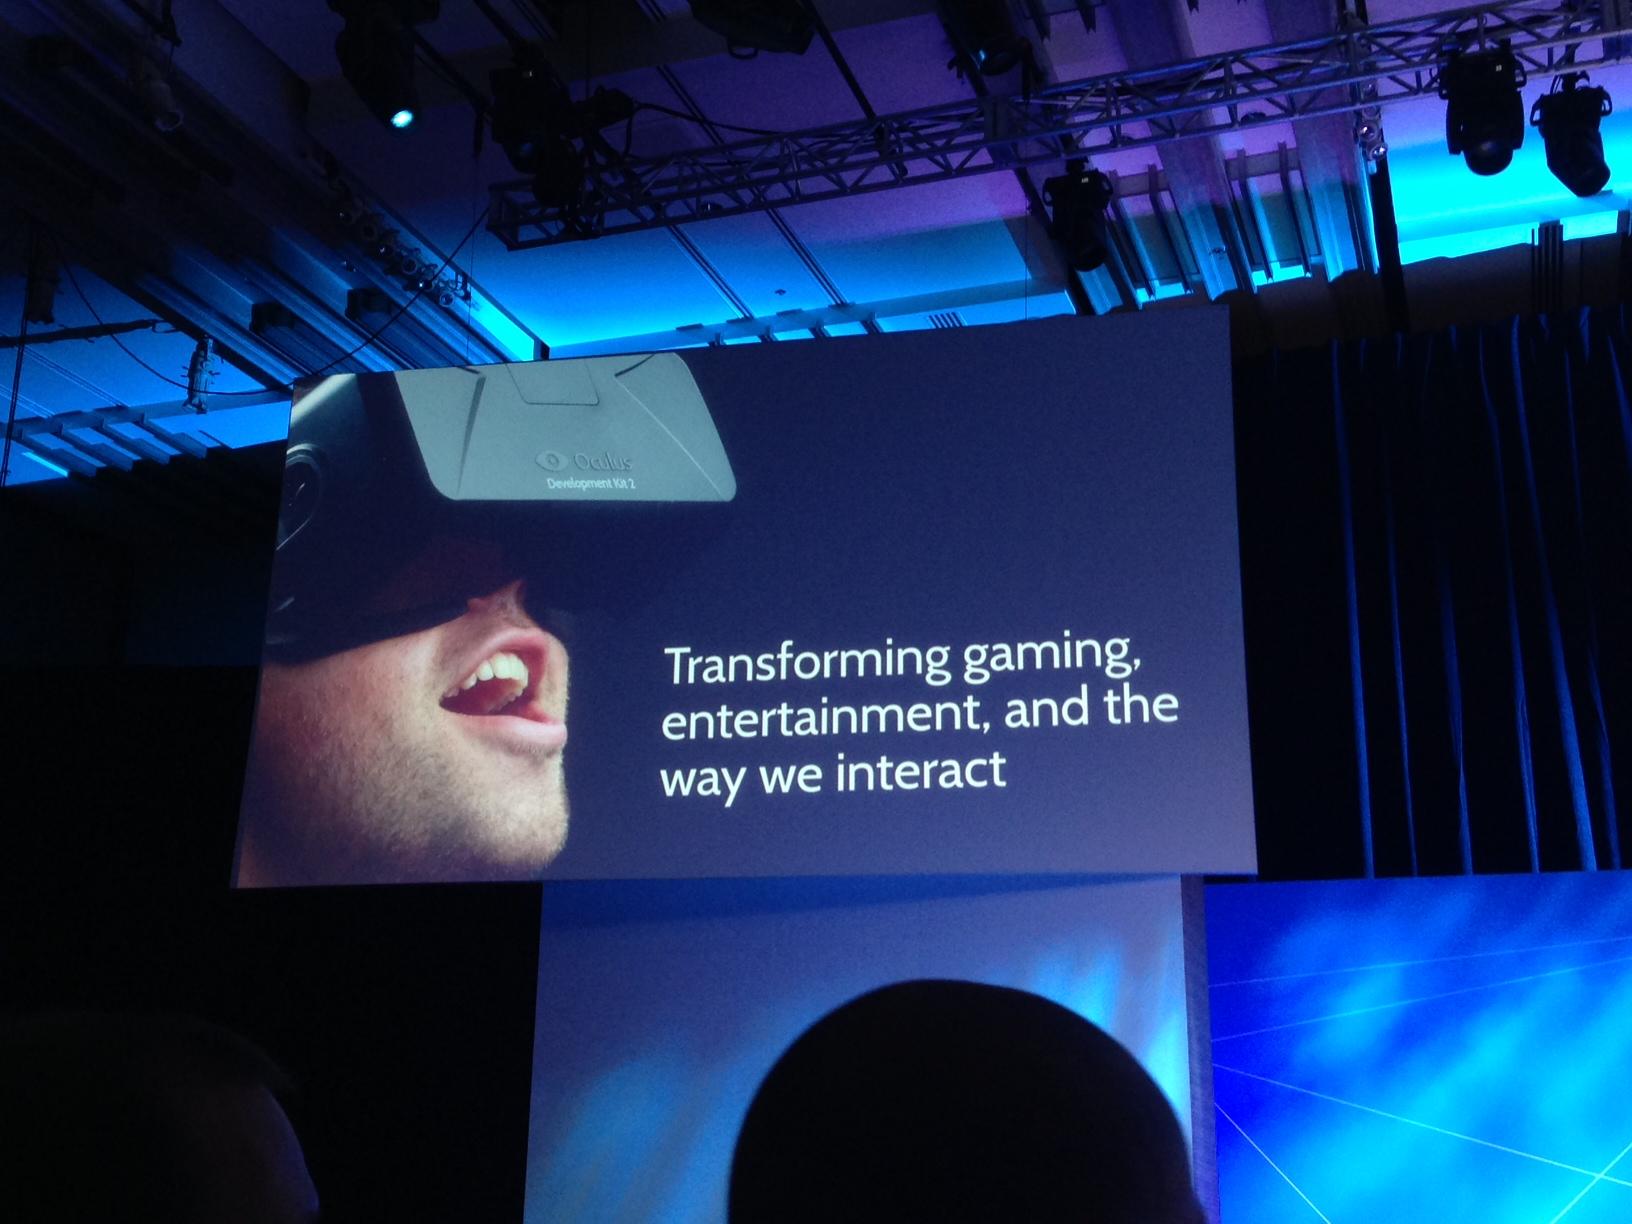 5ad05cd42b5d Oculus Announces Latest Prototype